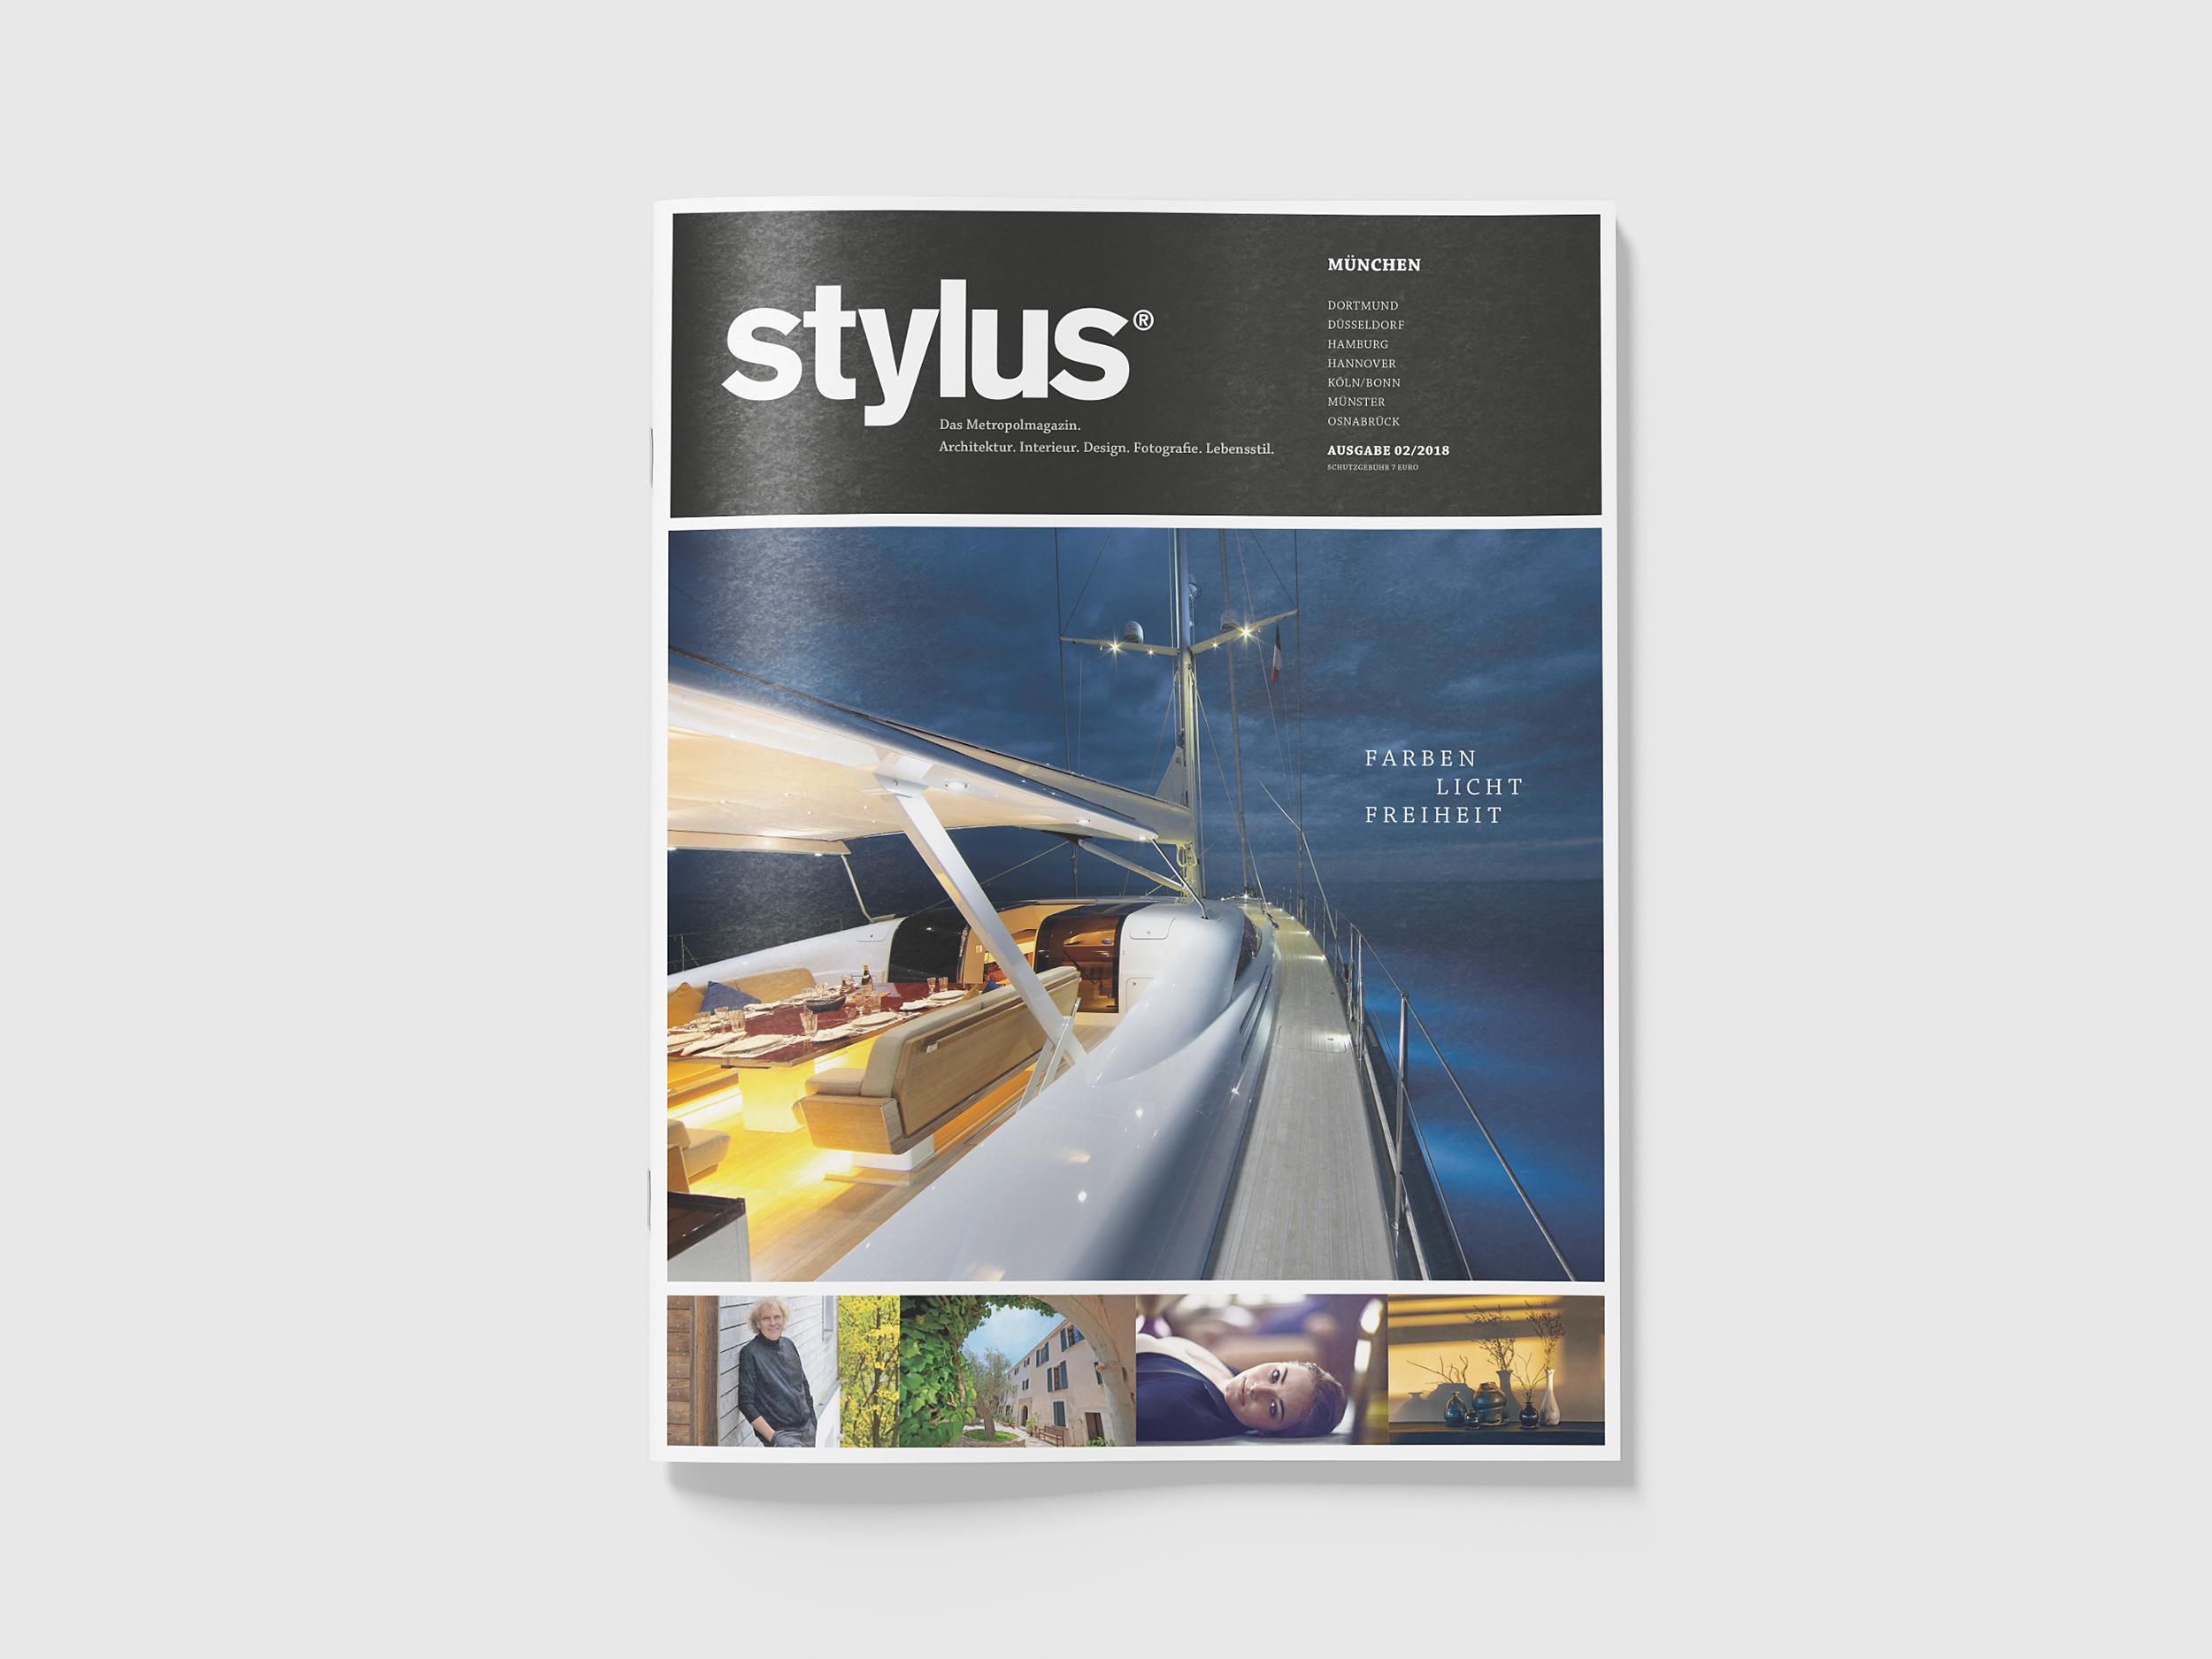 STYLUS_View-01_000_2500.jpg